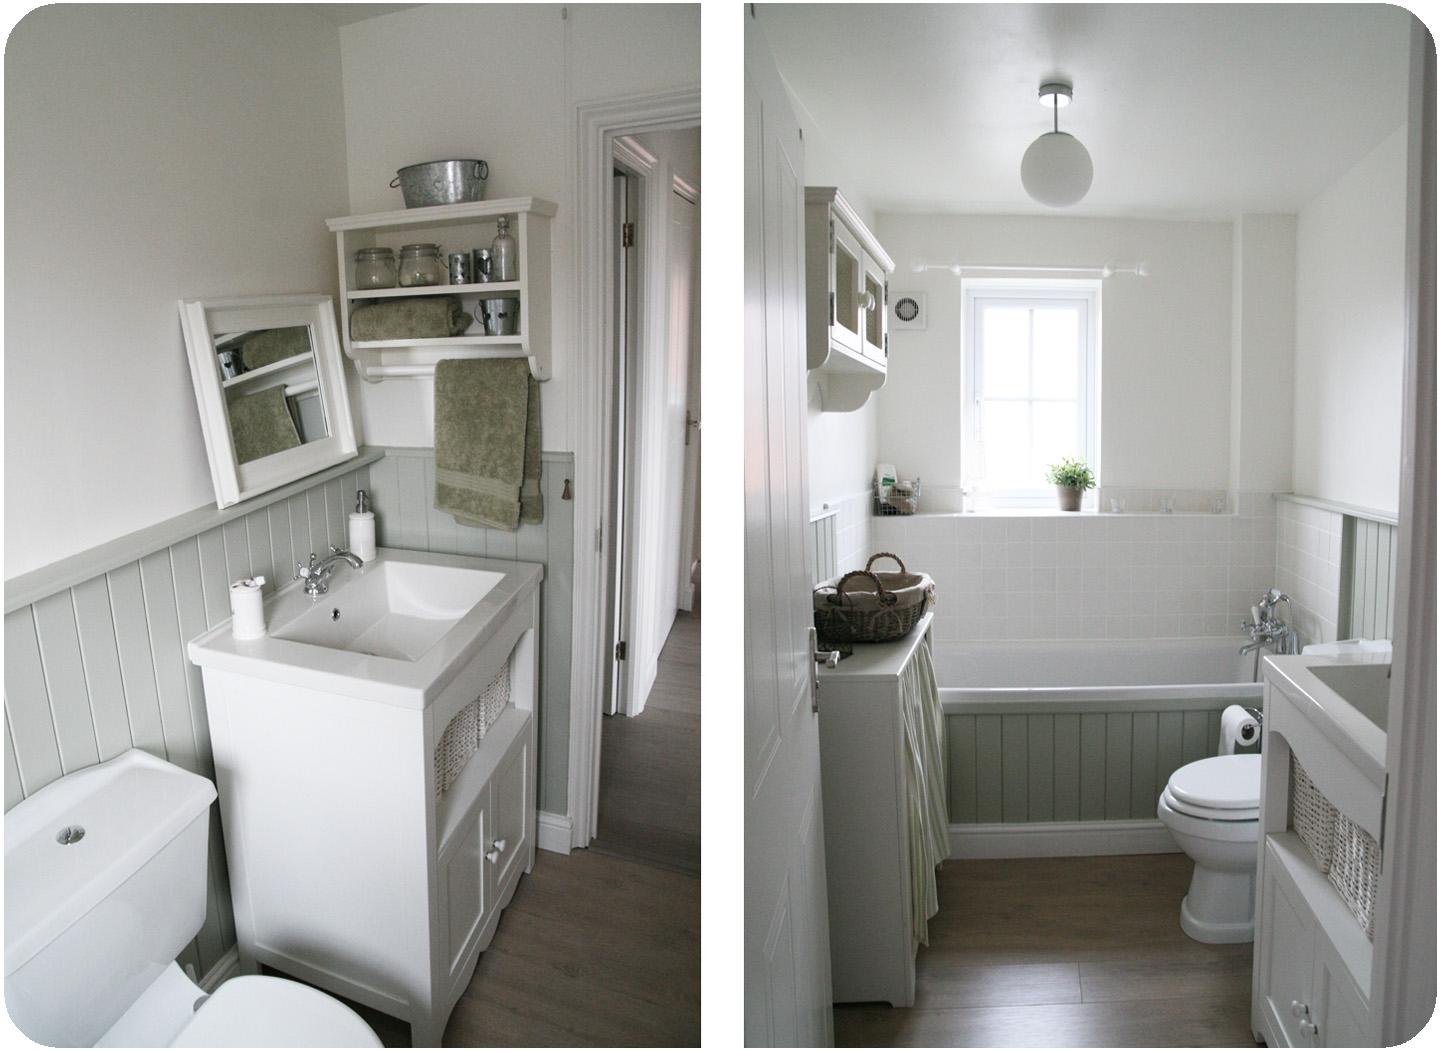 Bagno Shabby Chic Moderno : Shabby chic bagno foto e idee vasca da bagno shabby chic